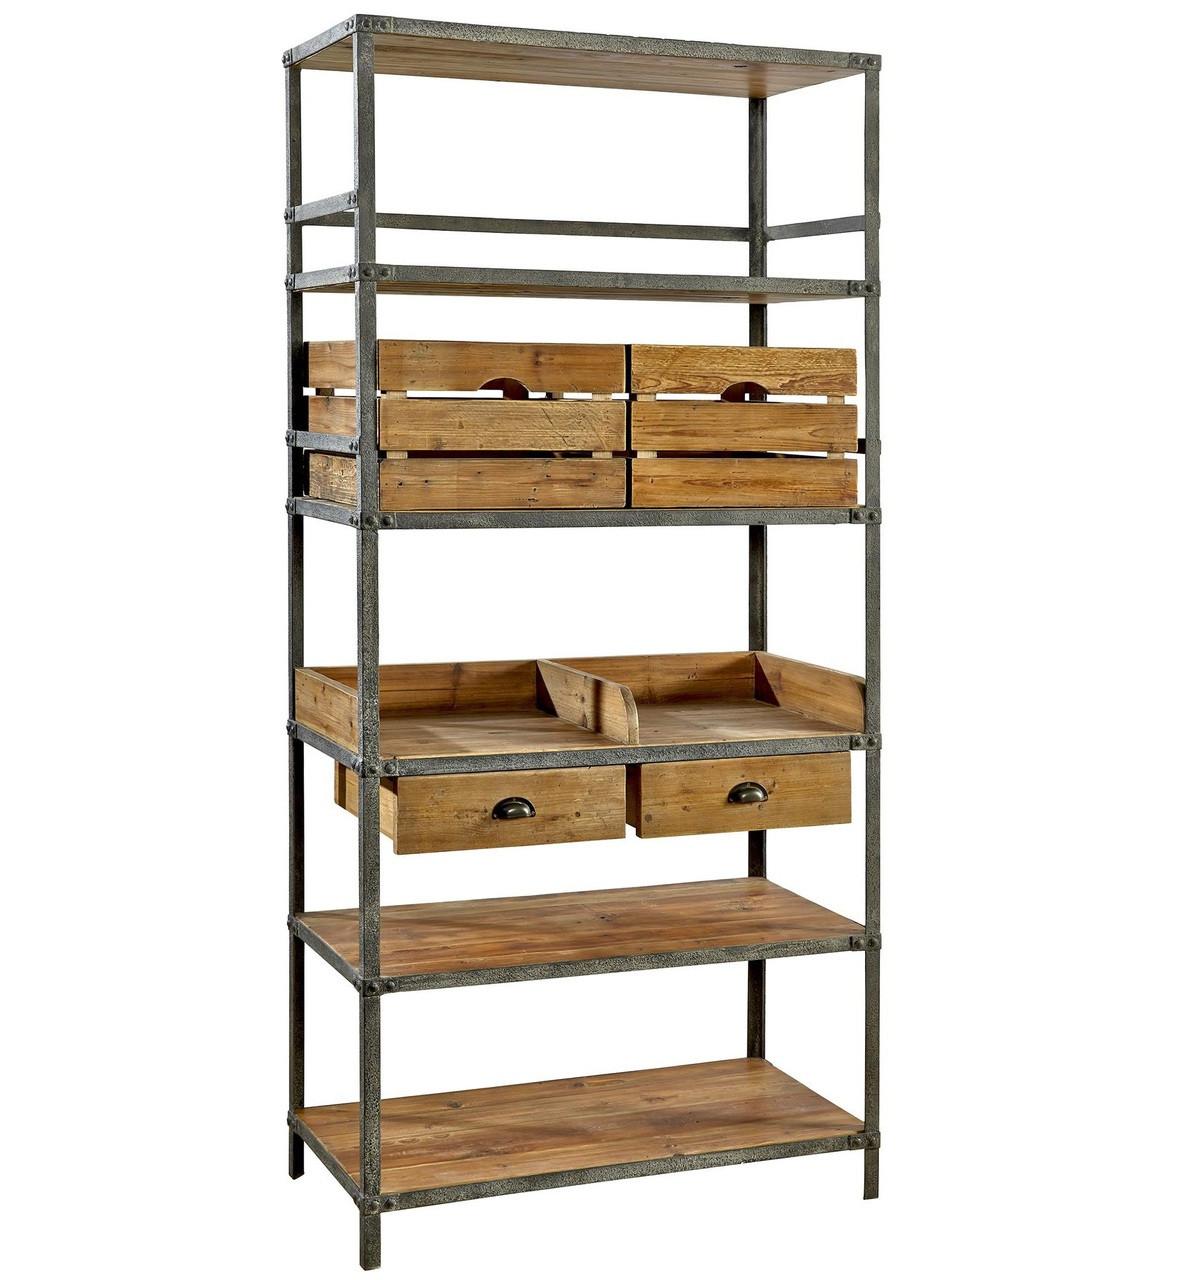 Breeland Industrial Metal + Wood Bookcase With Storage Bins